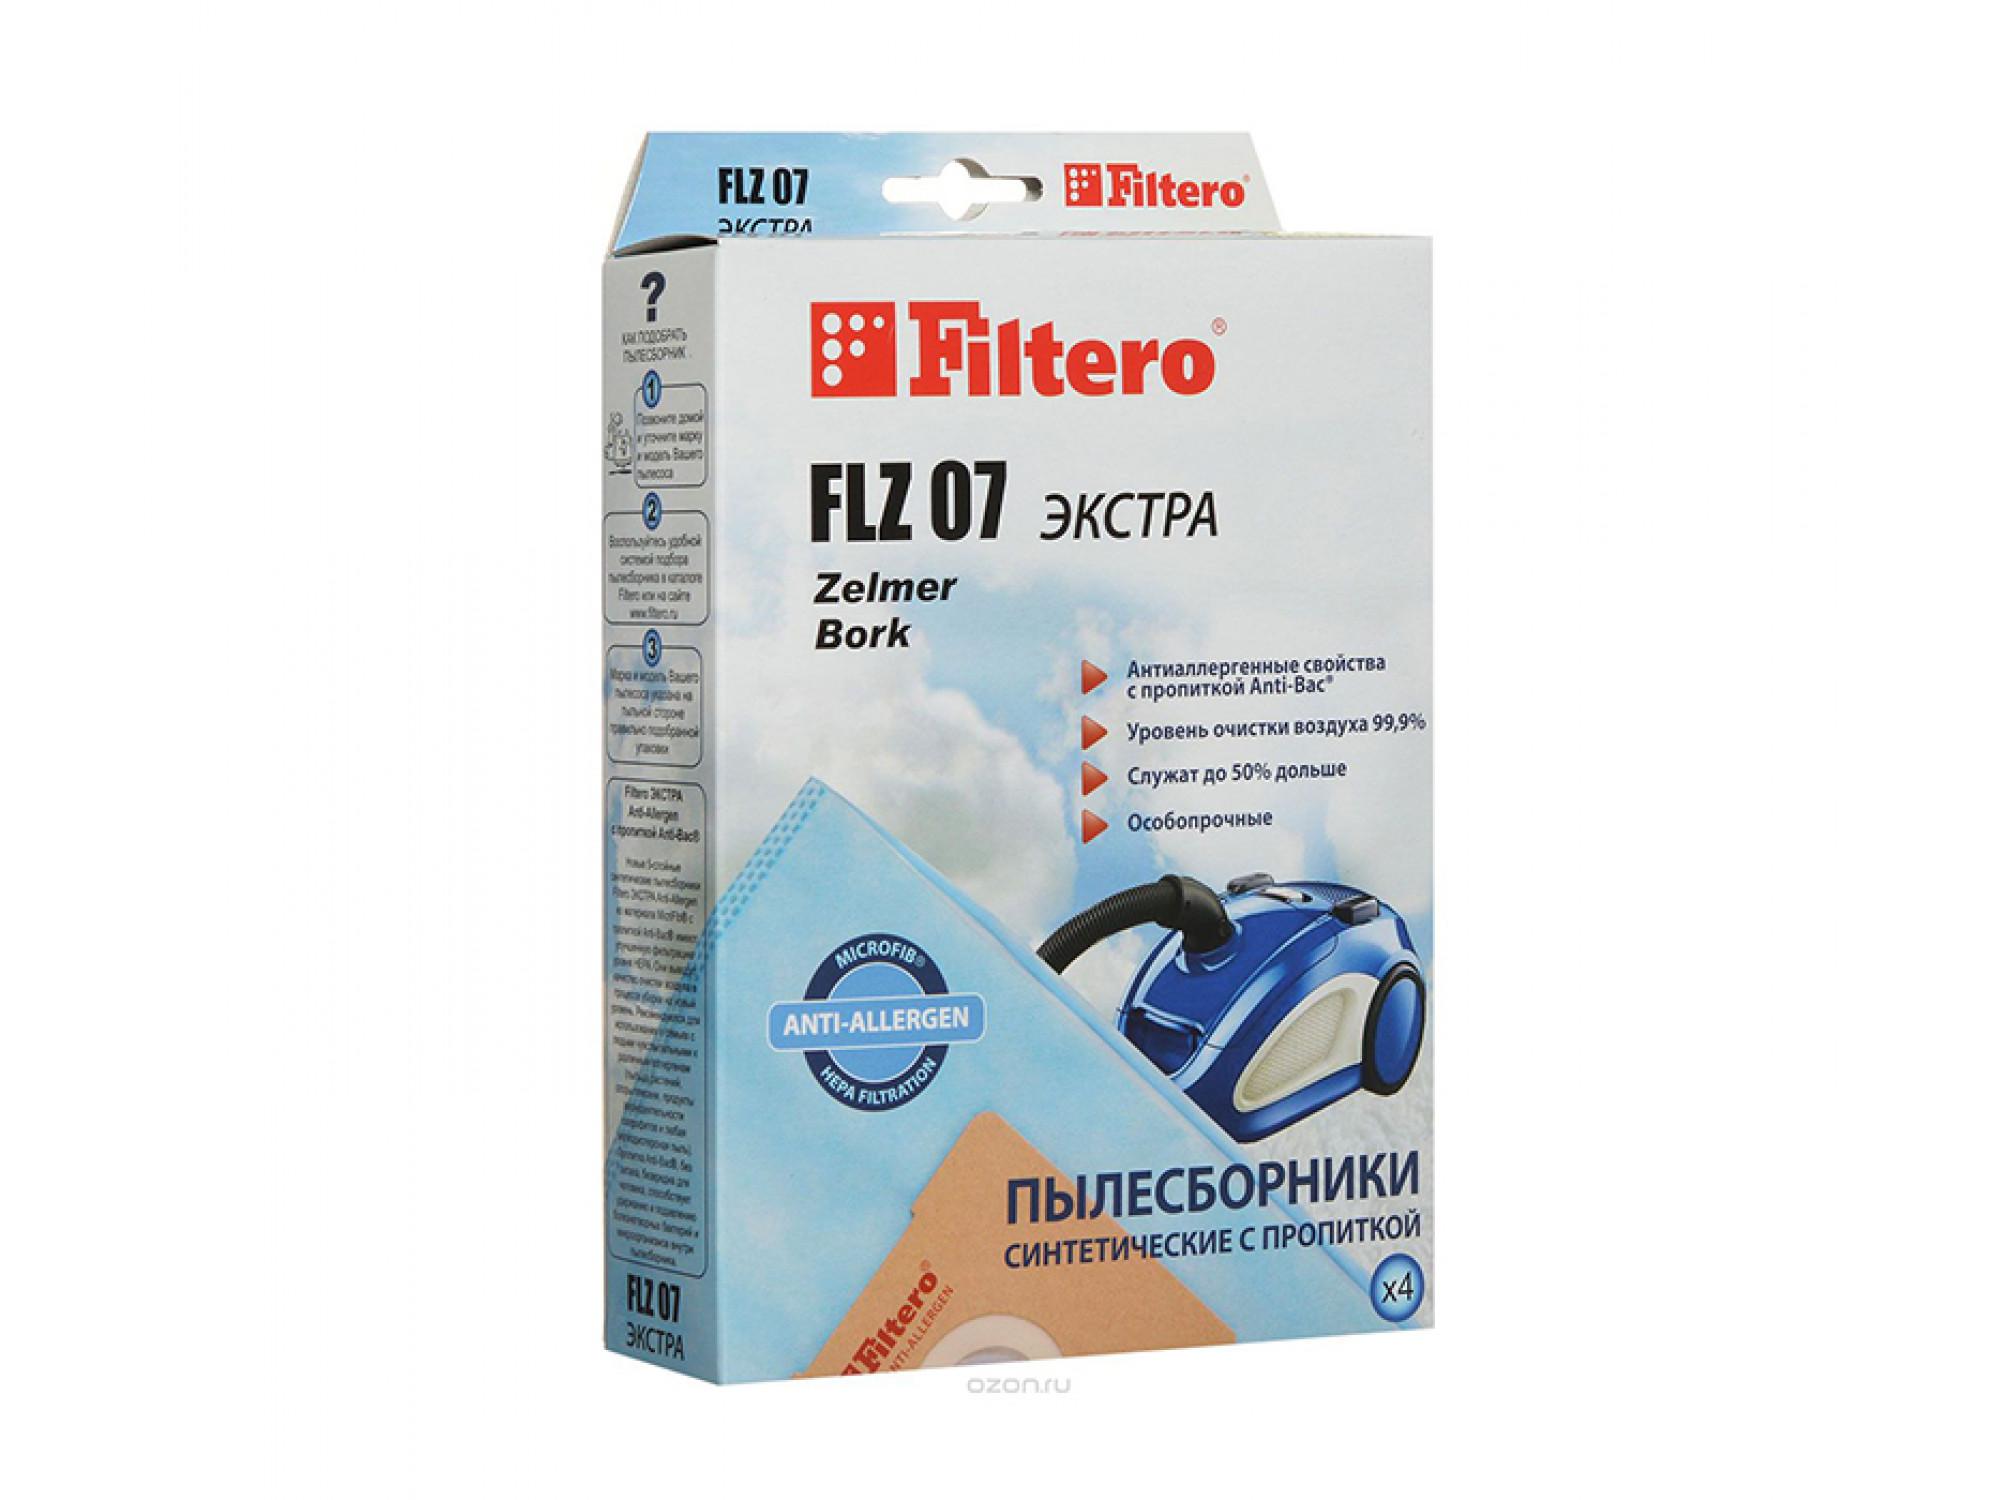 փոշեկուլի պարկ FILTERO FLZ 07 EX (x4)